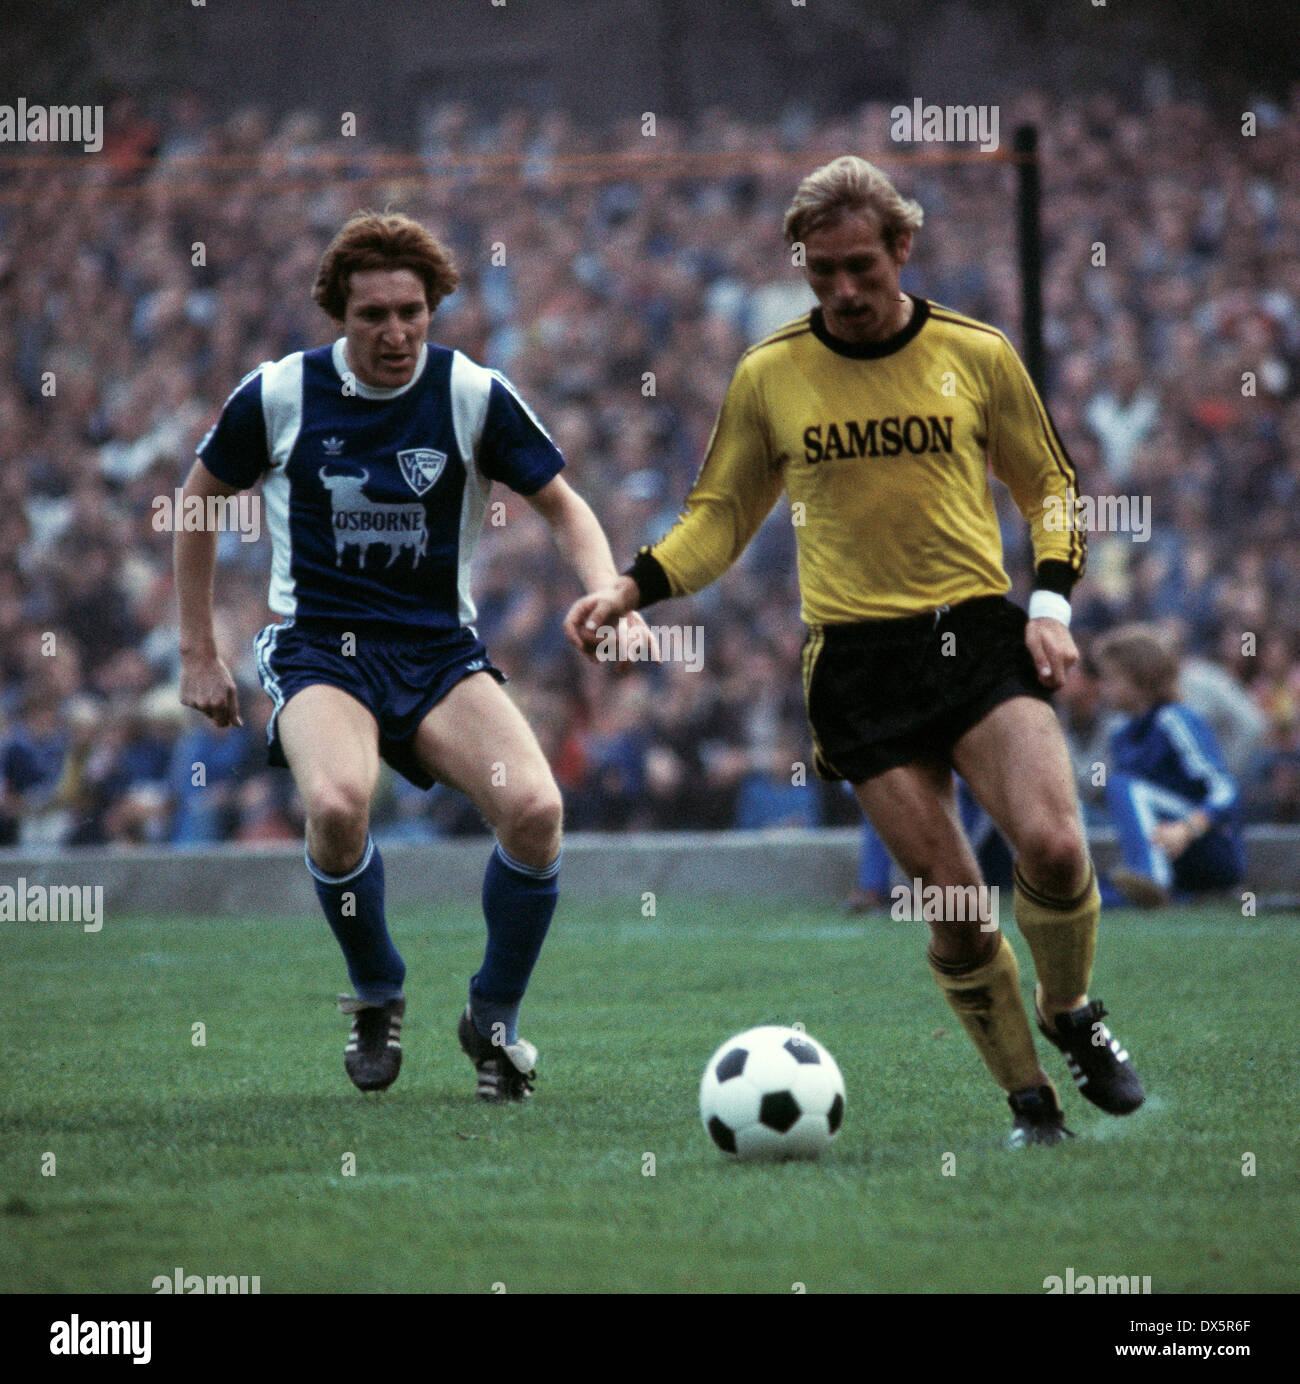 football, Bundesliga, 1976/1977, Stadium an der Castroper Strasse, VfL Bochum versus Borussia Dortmund 2:1, scene of the match, Michael Lameck (VfL) left and Hans-Gerd Schildt (BVB) - Stock Image